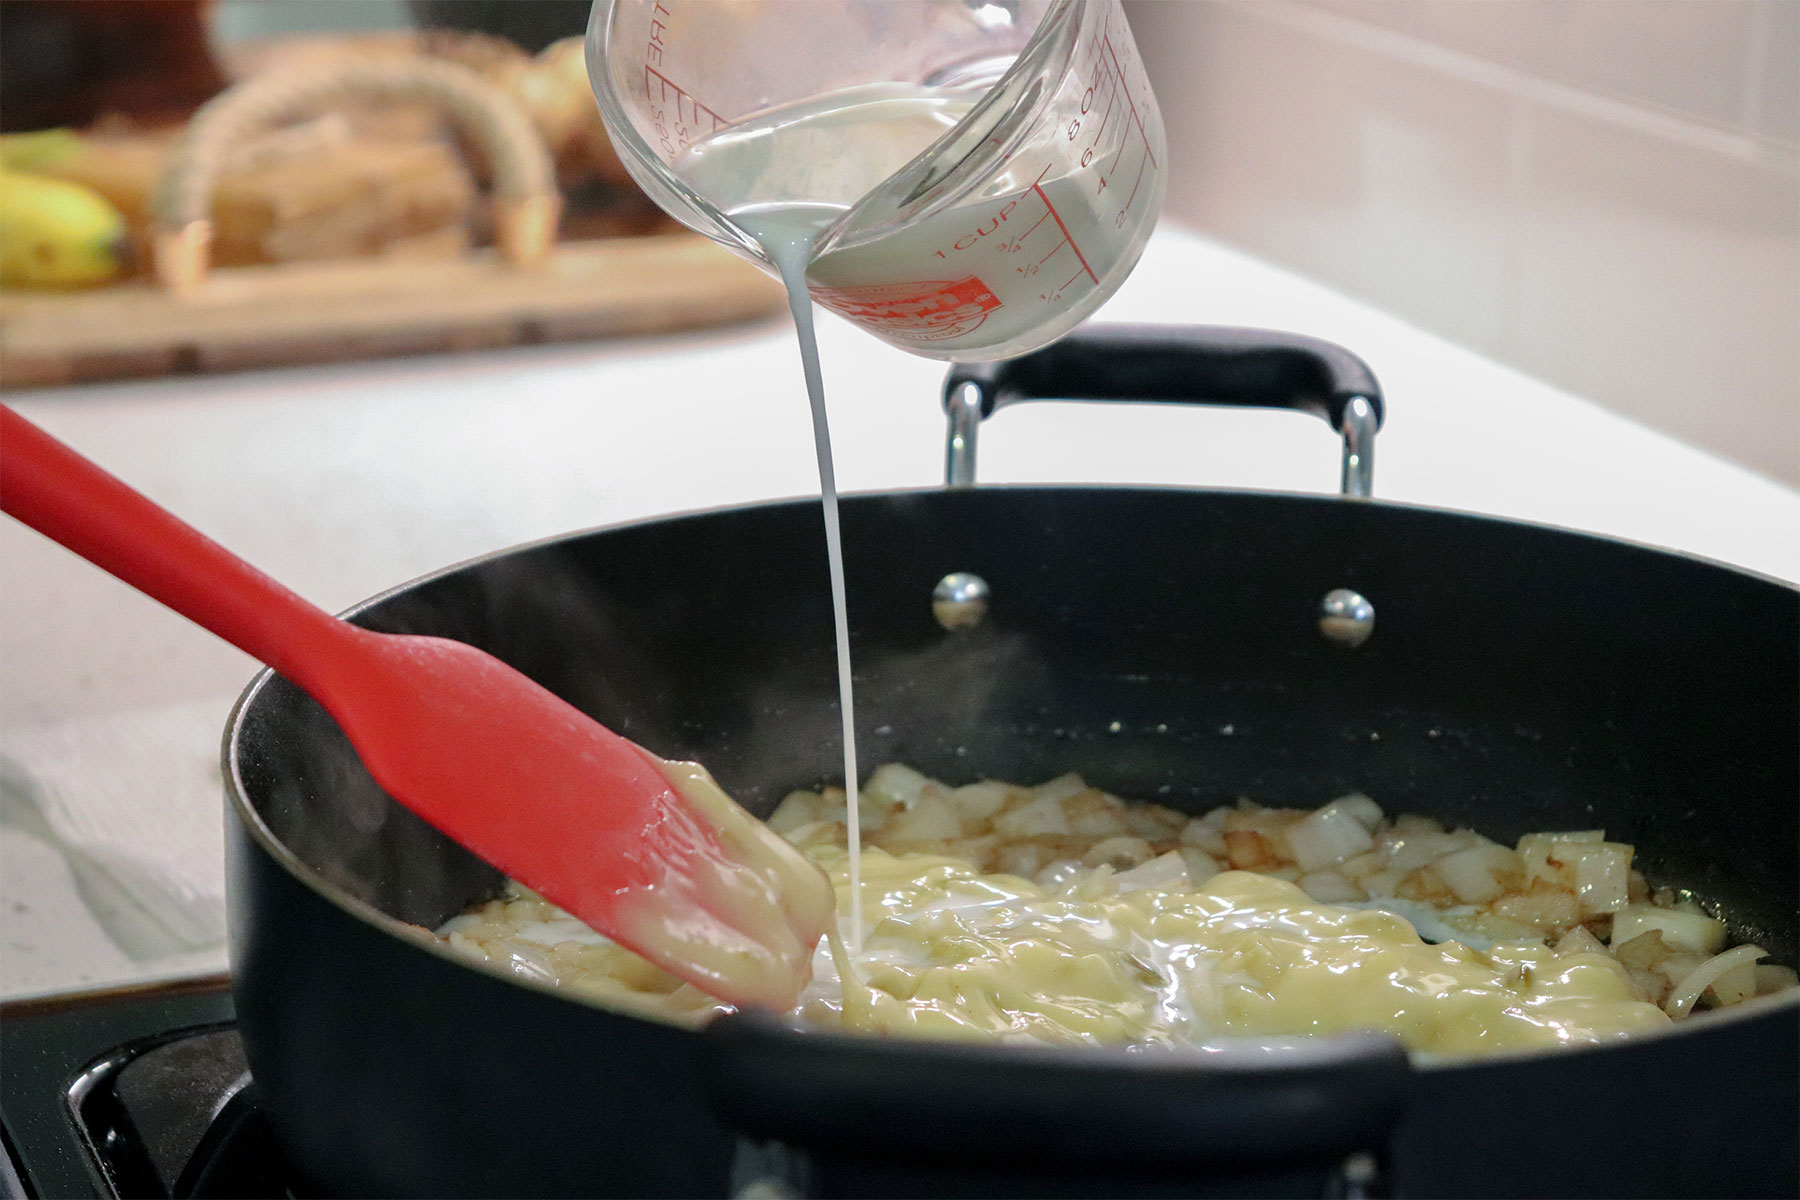 Adding milk to ingredients in cast iron skillet